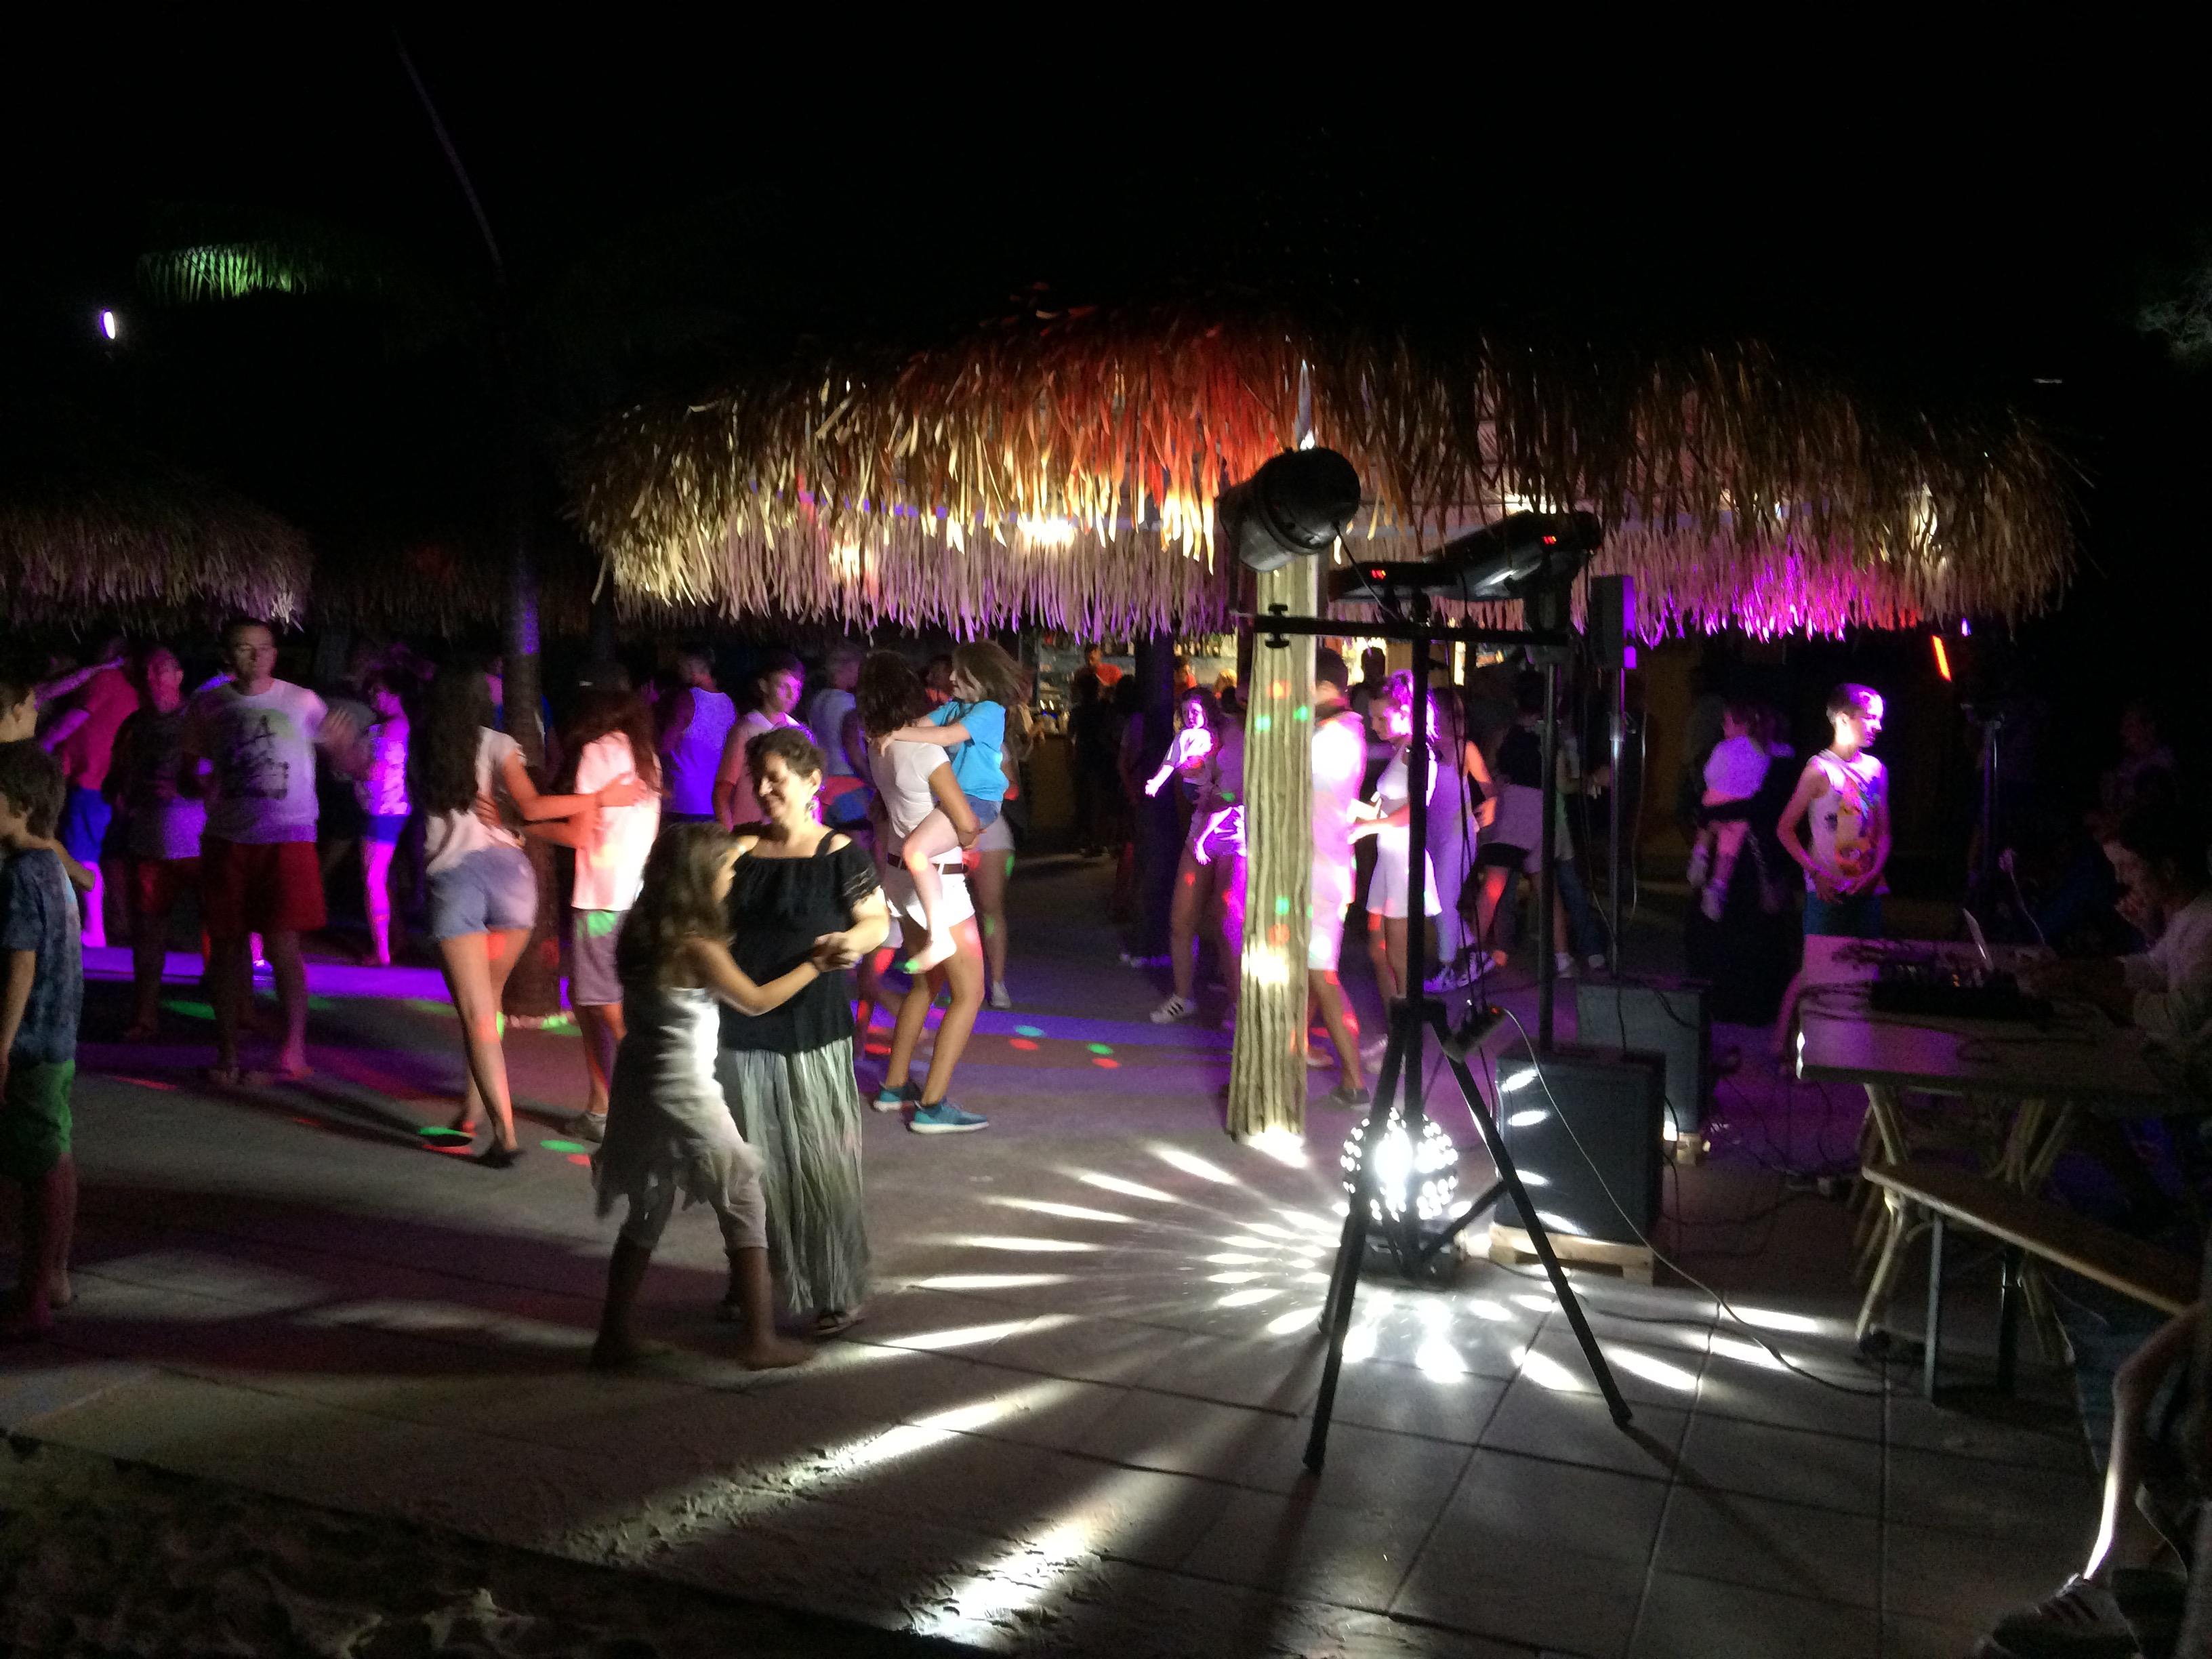 Mini Disco at the Beach Bar in Spiaggia e Mare Holiday Park, Italy